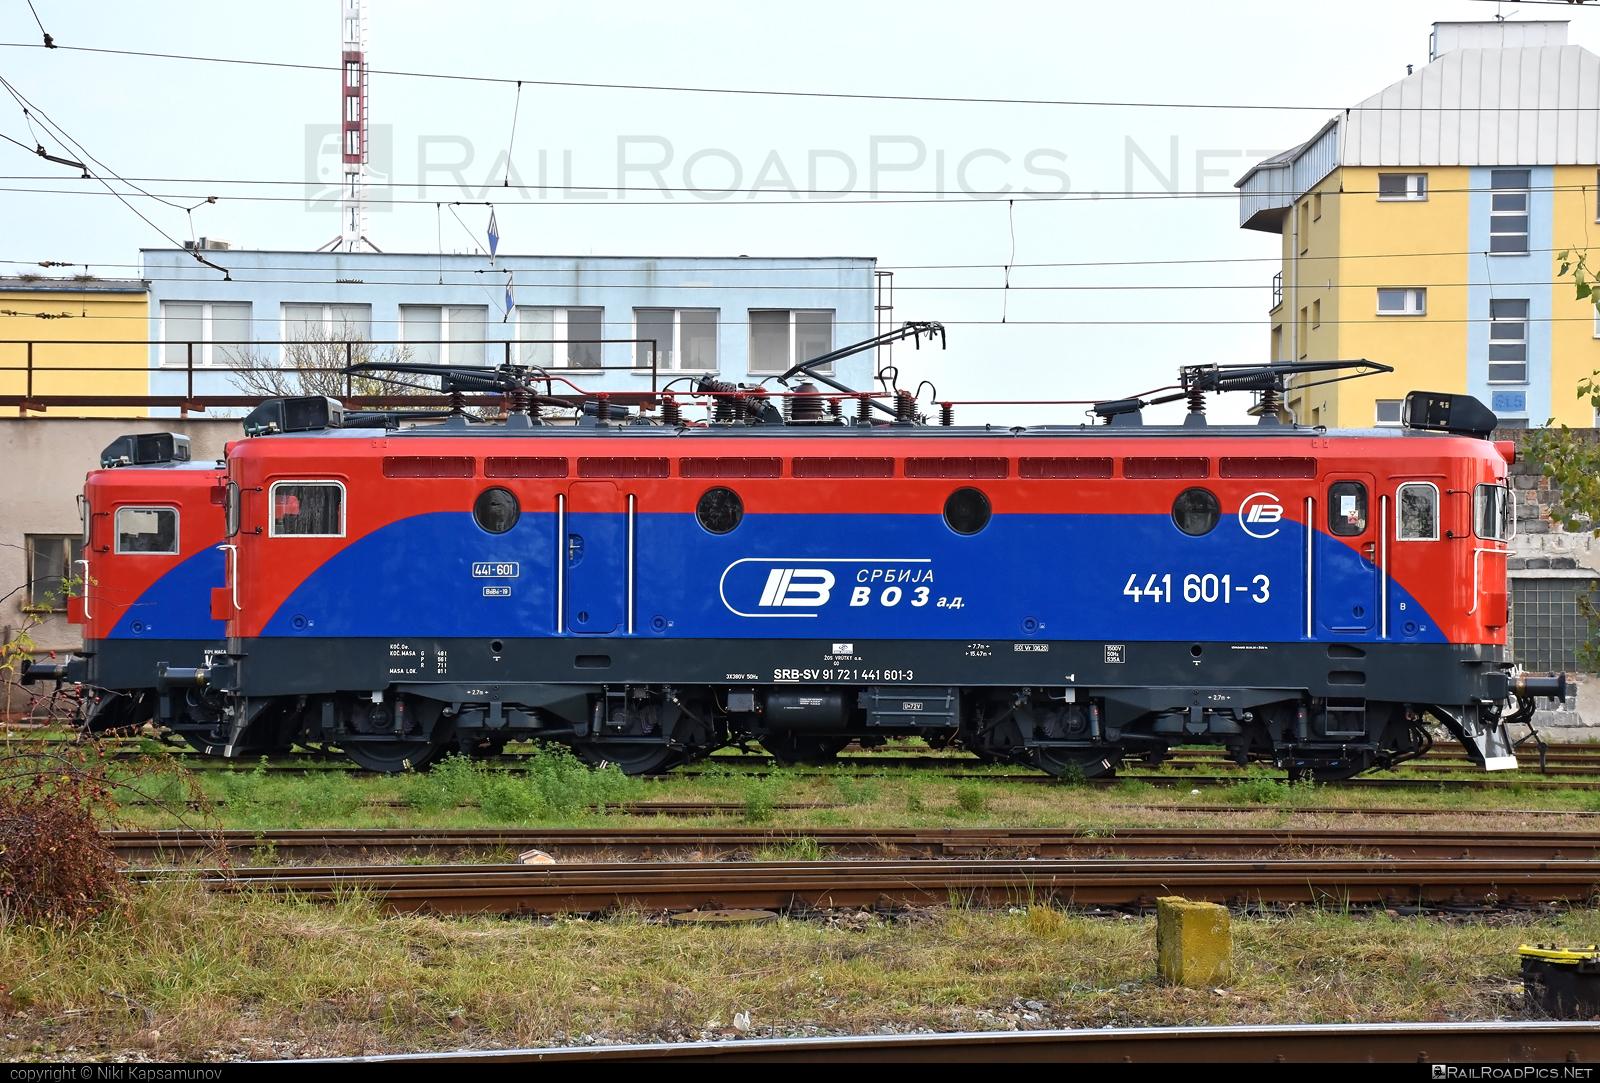 Končar JŽ class 441 - 441 601-3 operated by Srbija voz a.d. #jz441 #koncar #koncar441 #srbijavoz #srbijavozad